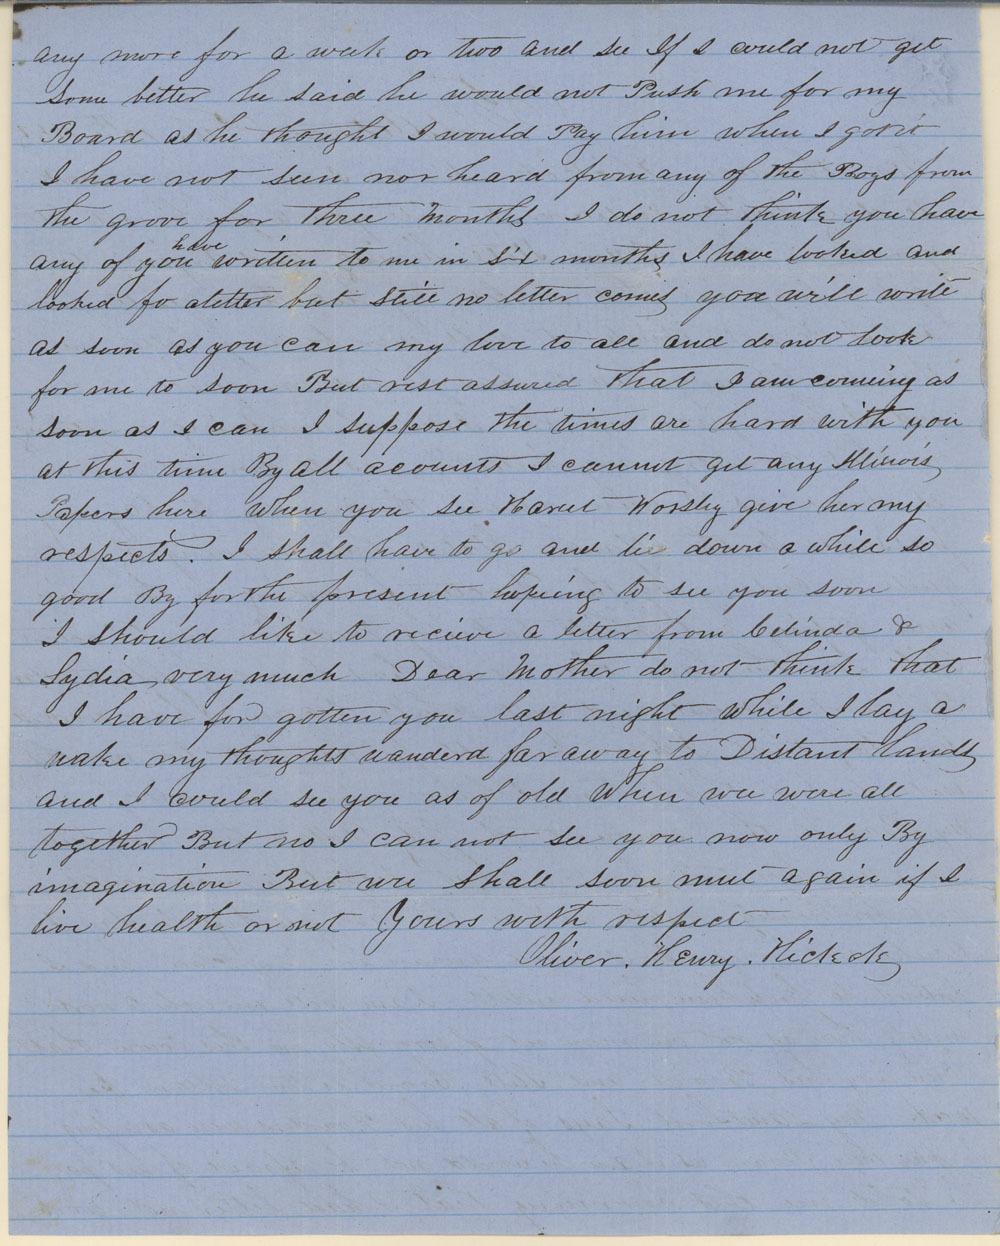 James Butler (Wild Bill) Hickok family collection - February 12, 1855, p2